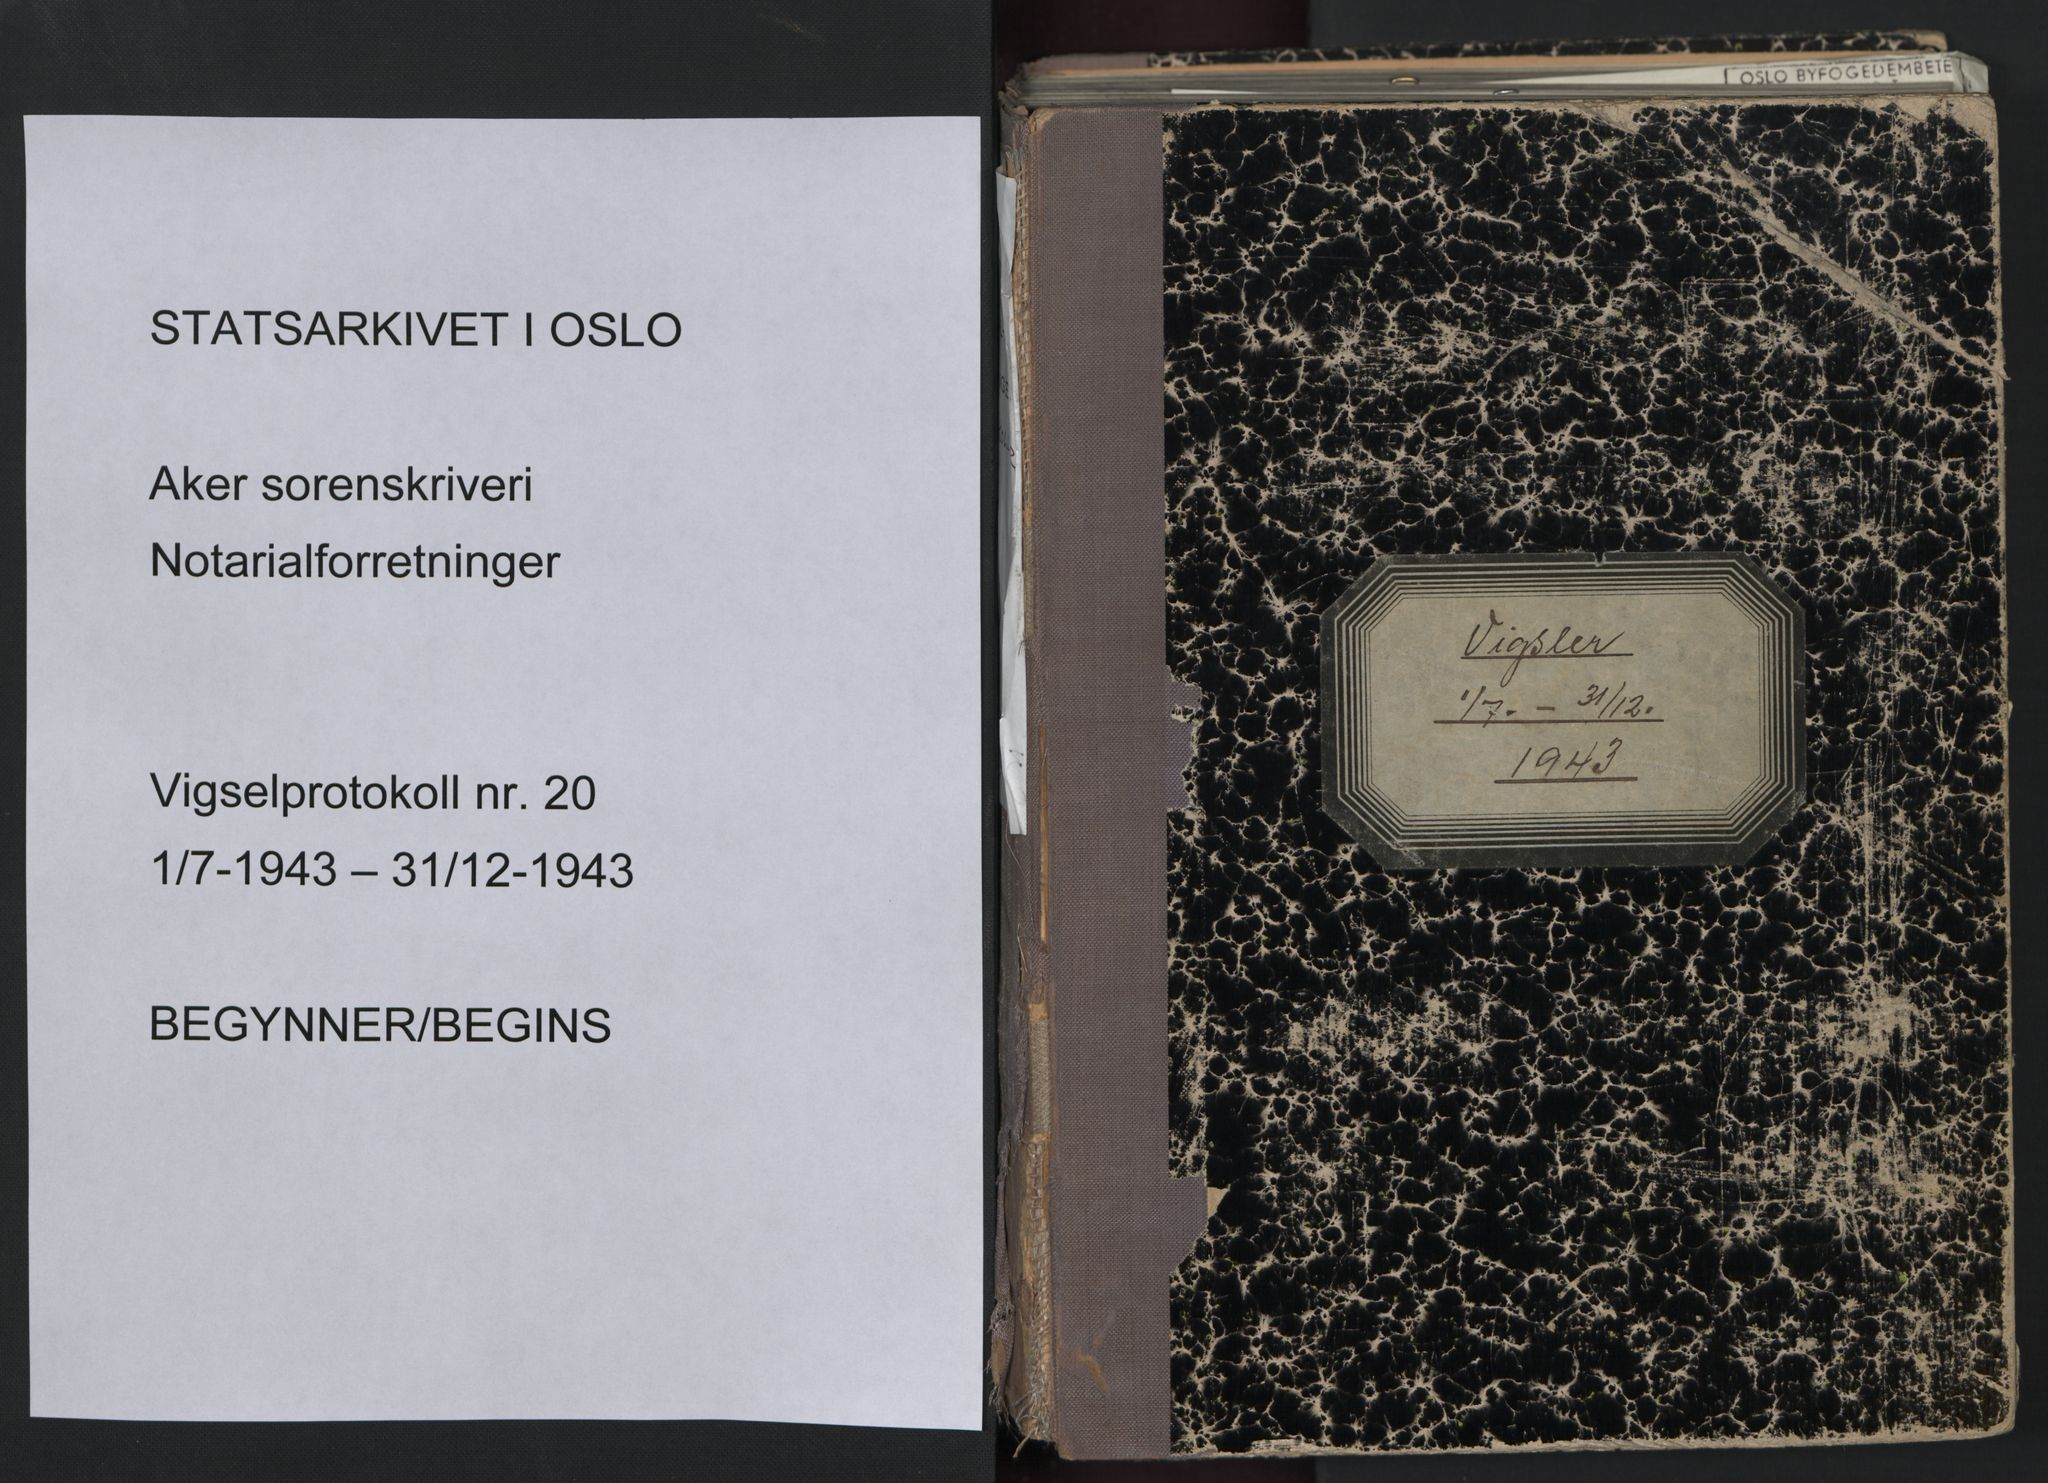 SAO, Aker sorenskriveri, L/Lc/Lcb/L0020: Vigselprotokoll, 1943, s. upaginert